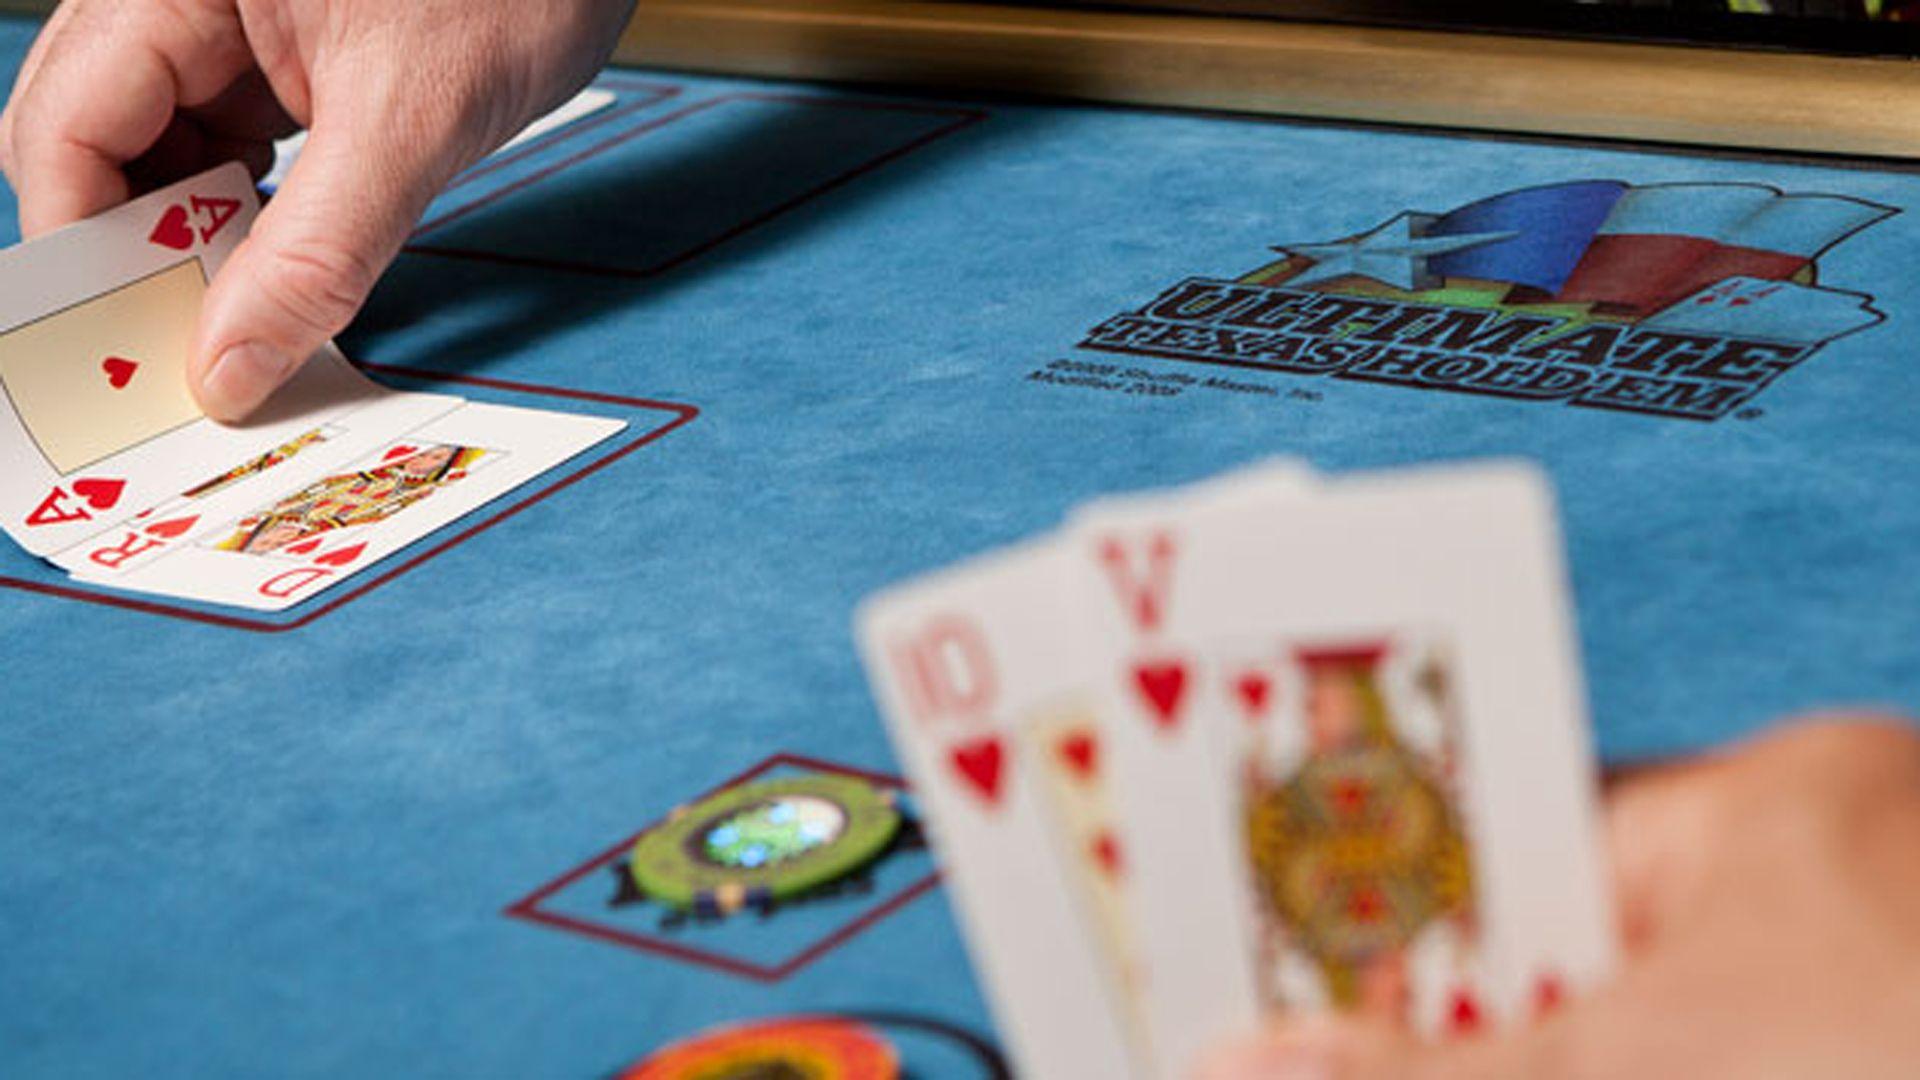 Online Casinos to Win Real Money